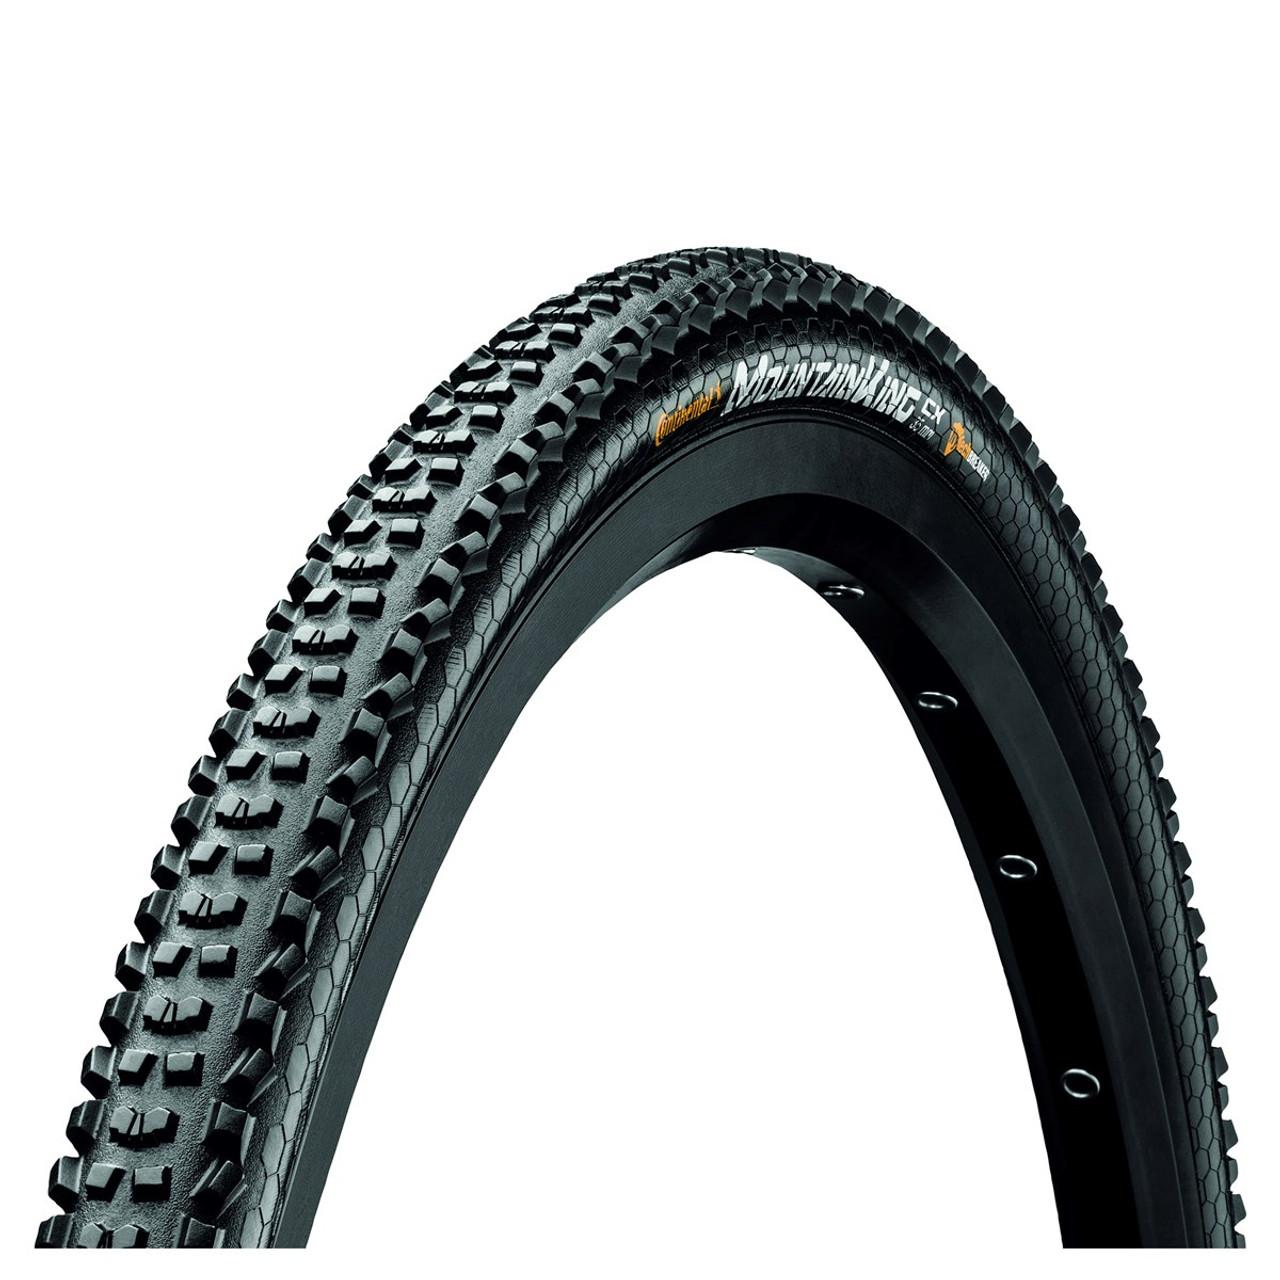 Continental Mountain King CX Performance Puregrip Folding Tyre 700 x 35c